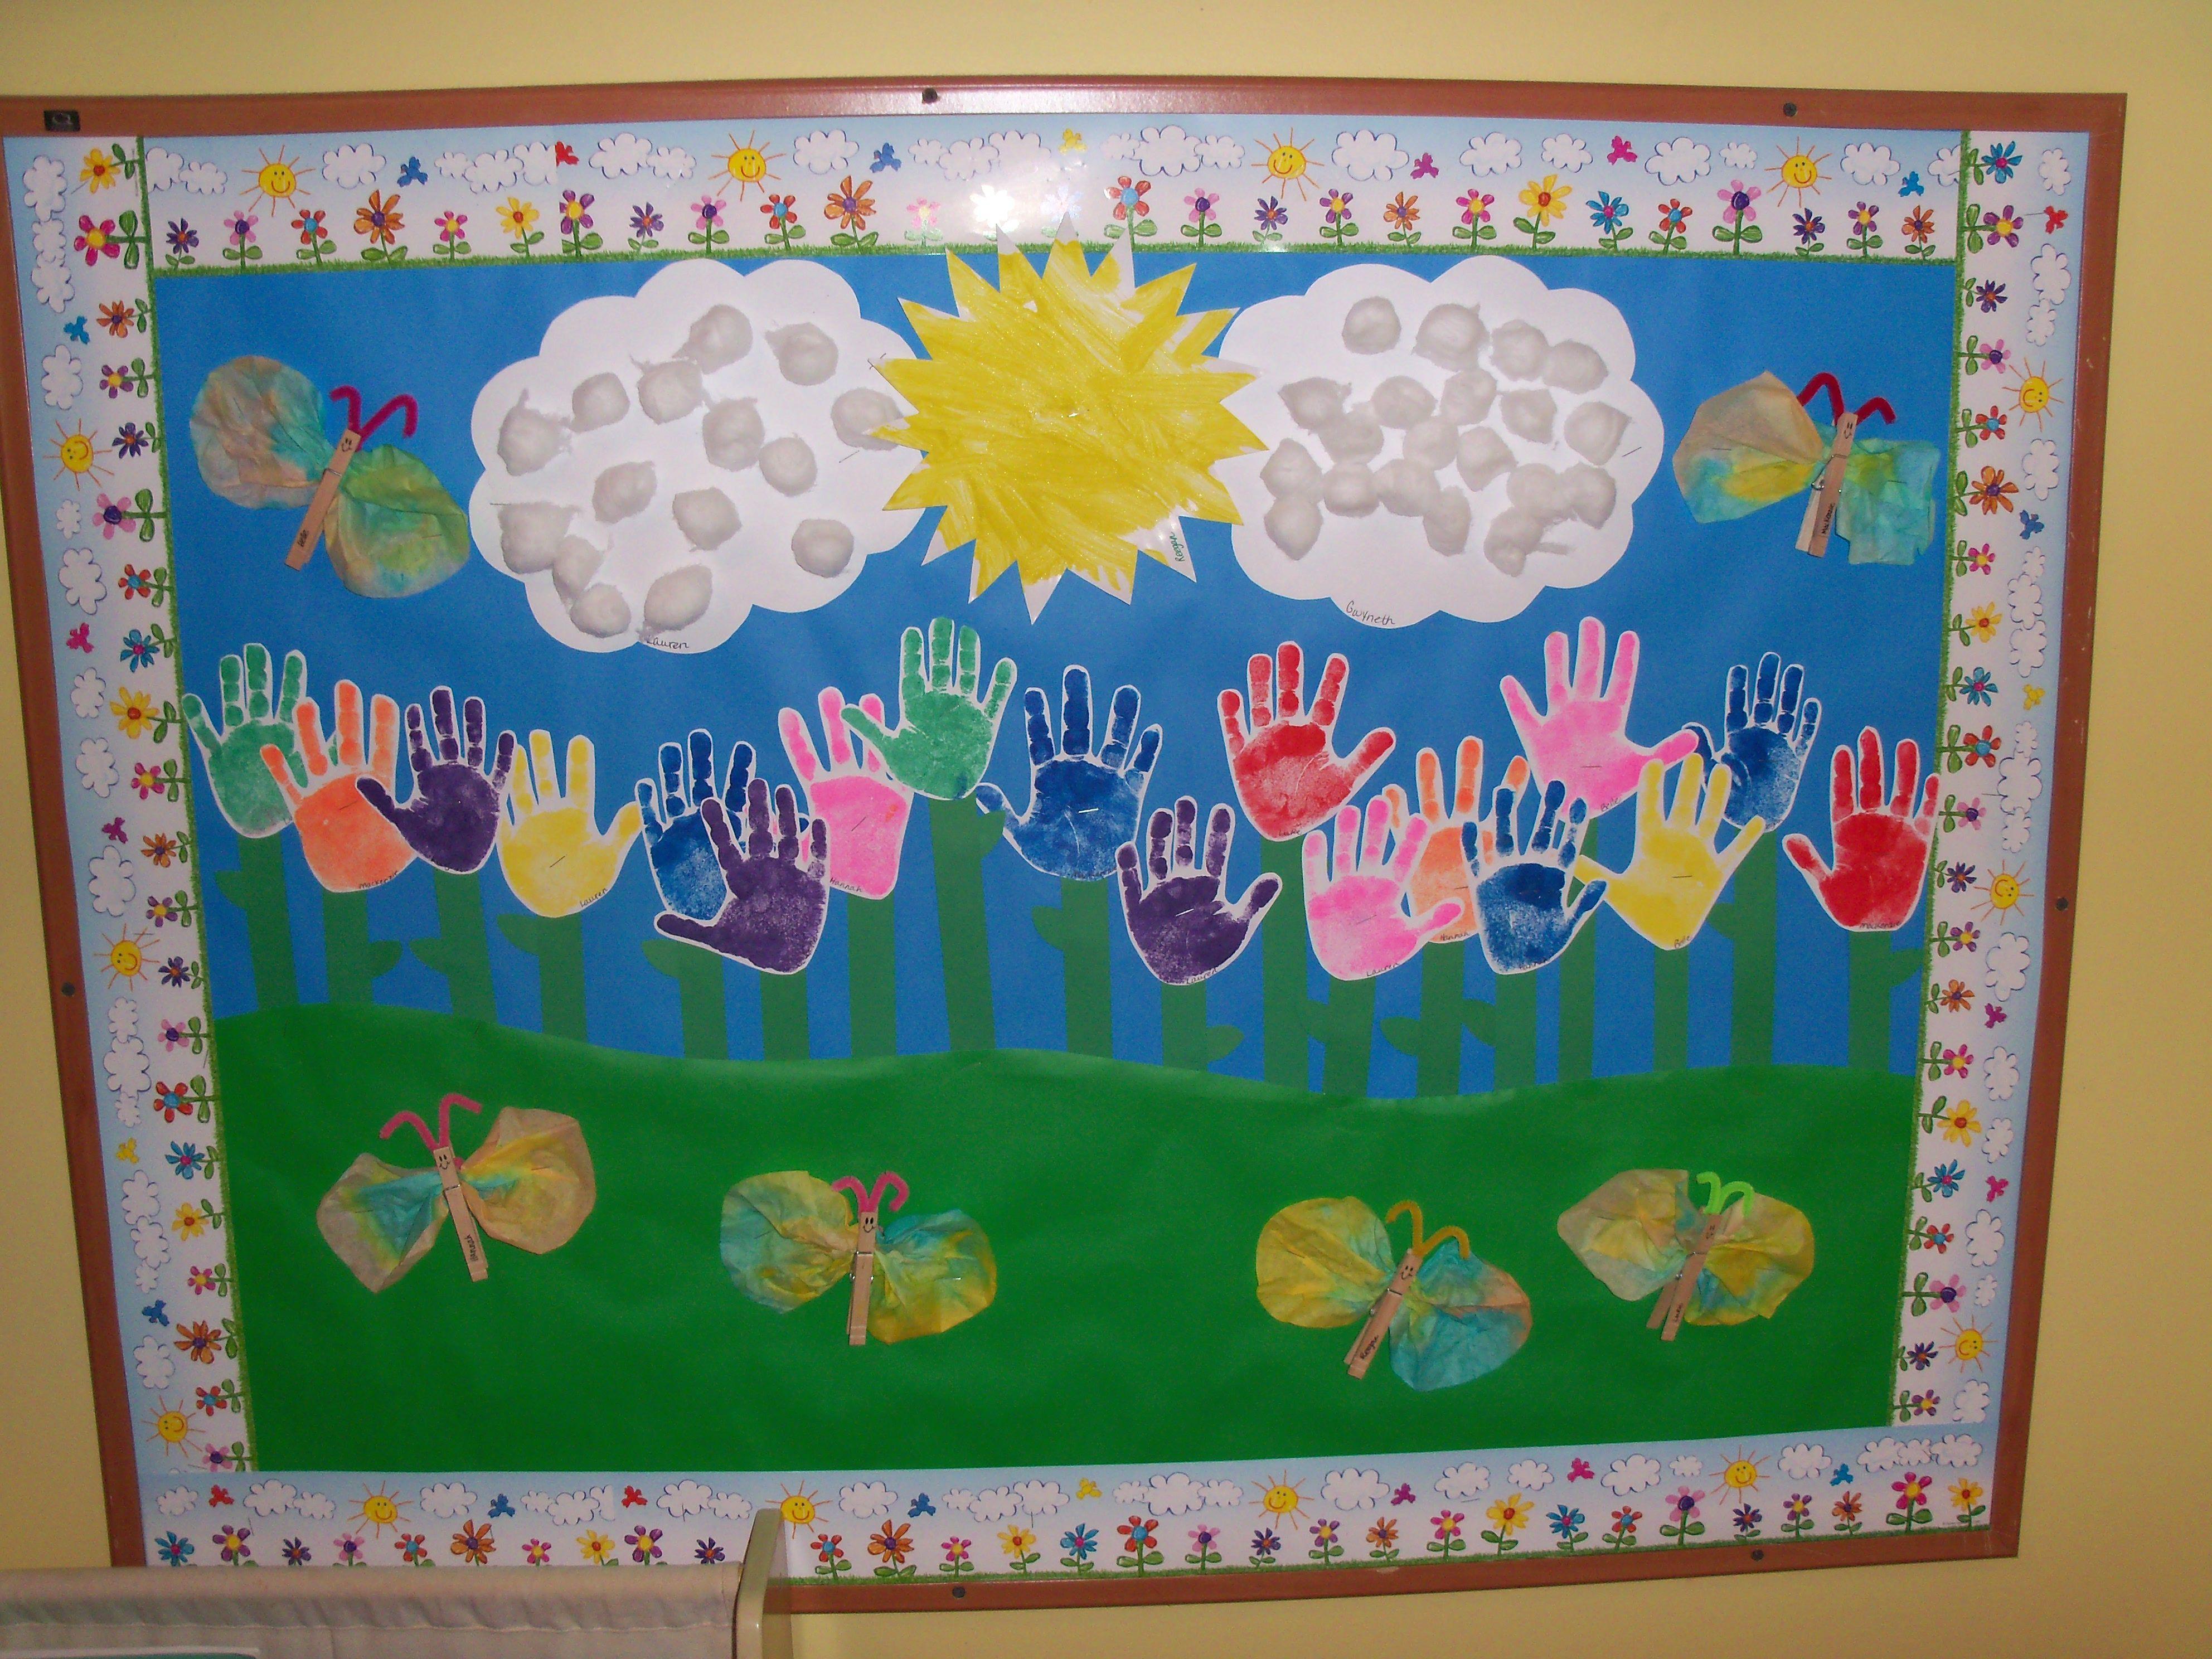 Innovative Classroom Projects : Preschool spring bulletin board looks like fun for my